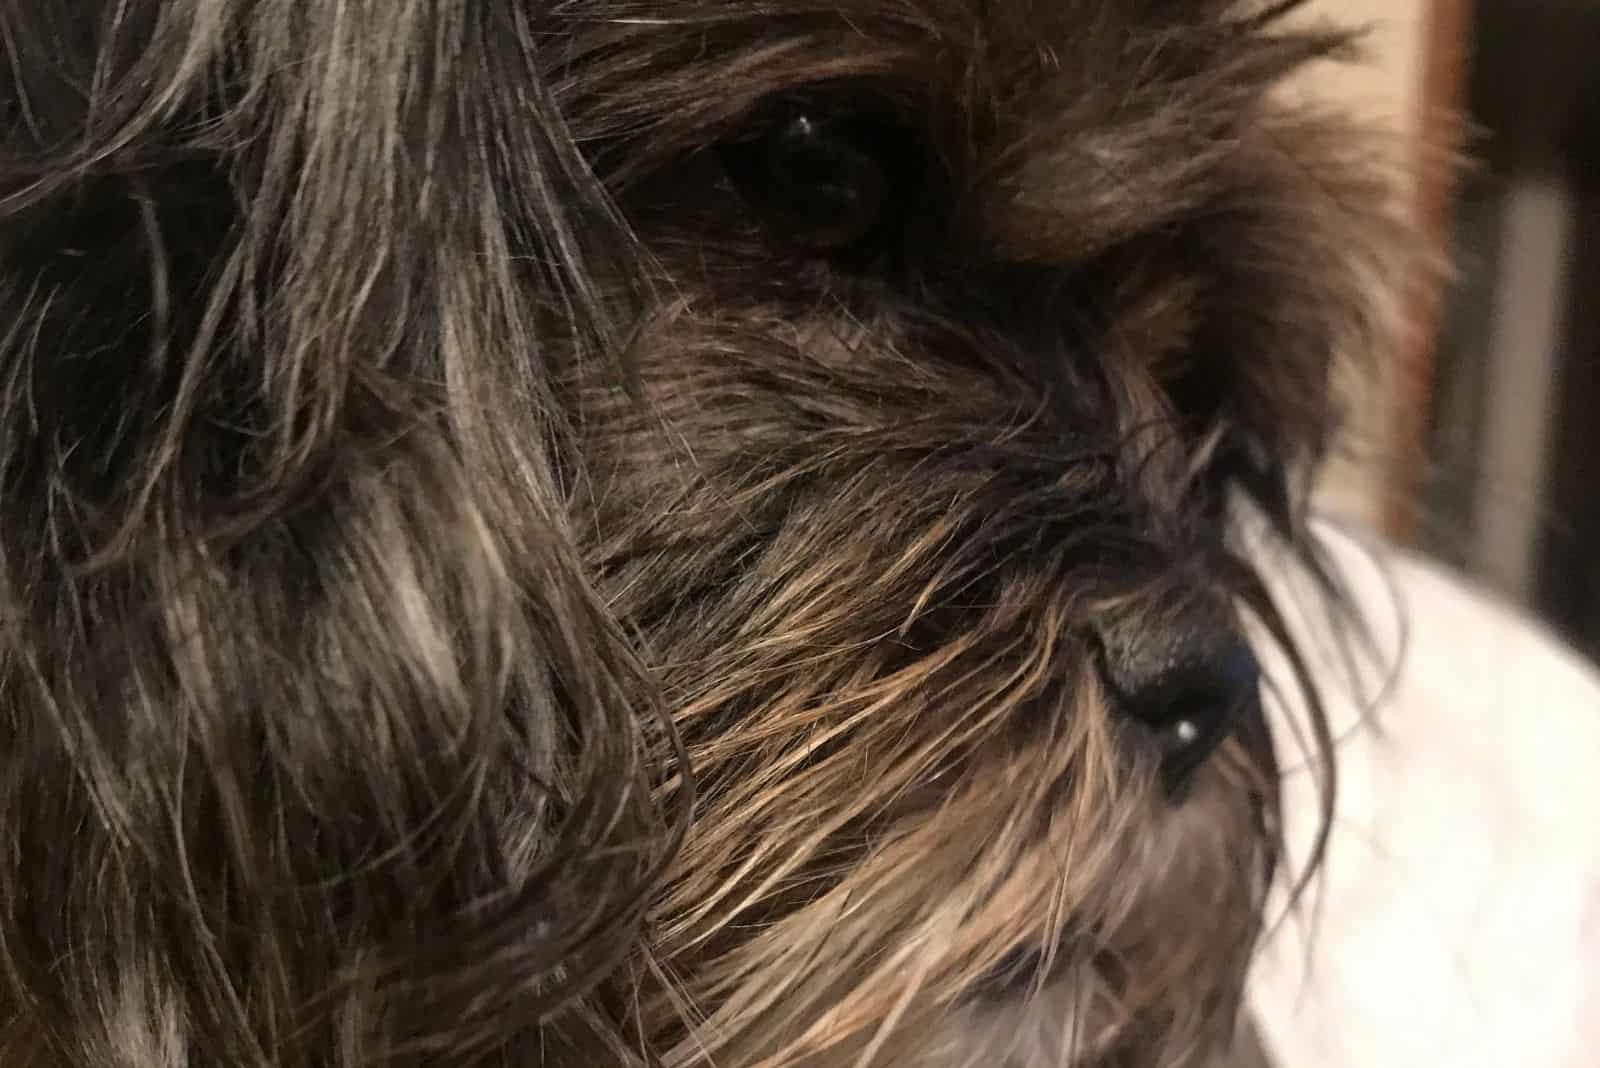 choco shih tzu dog in close up sideview image